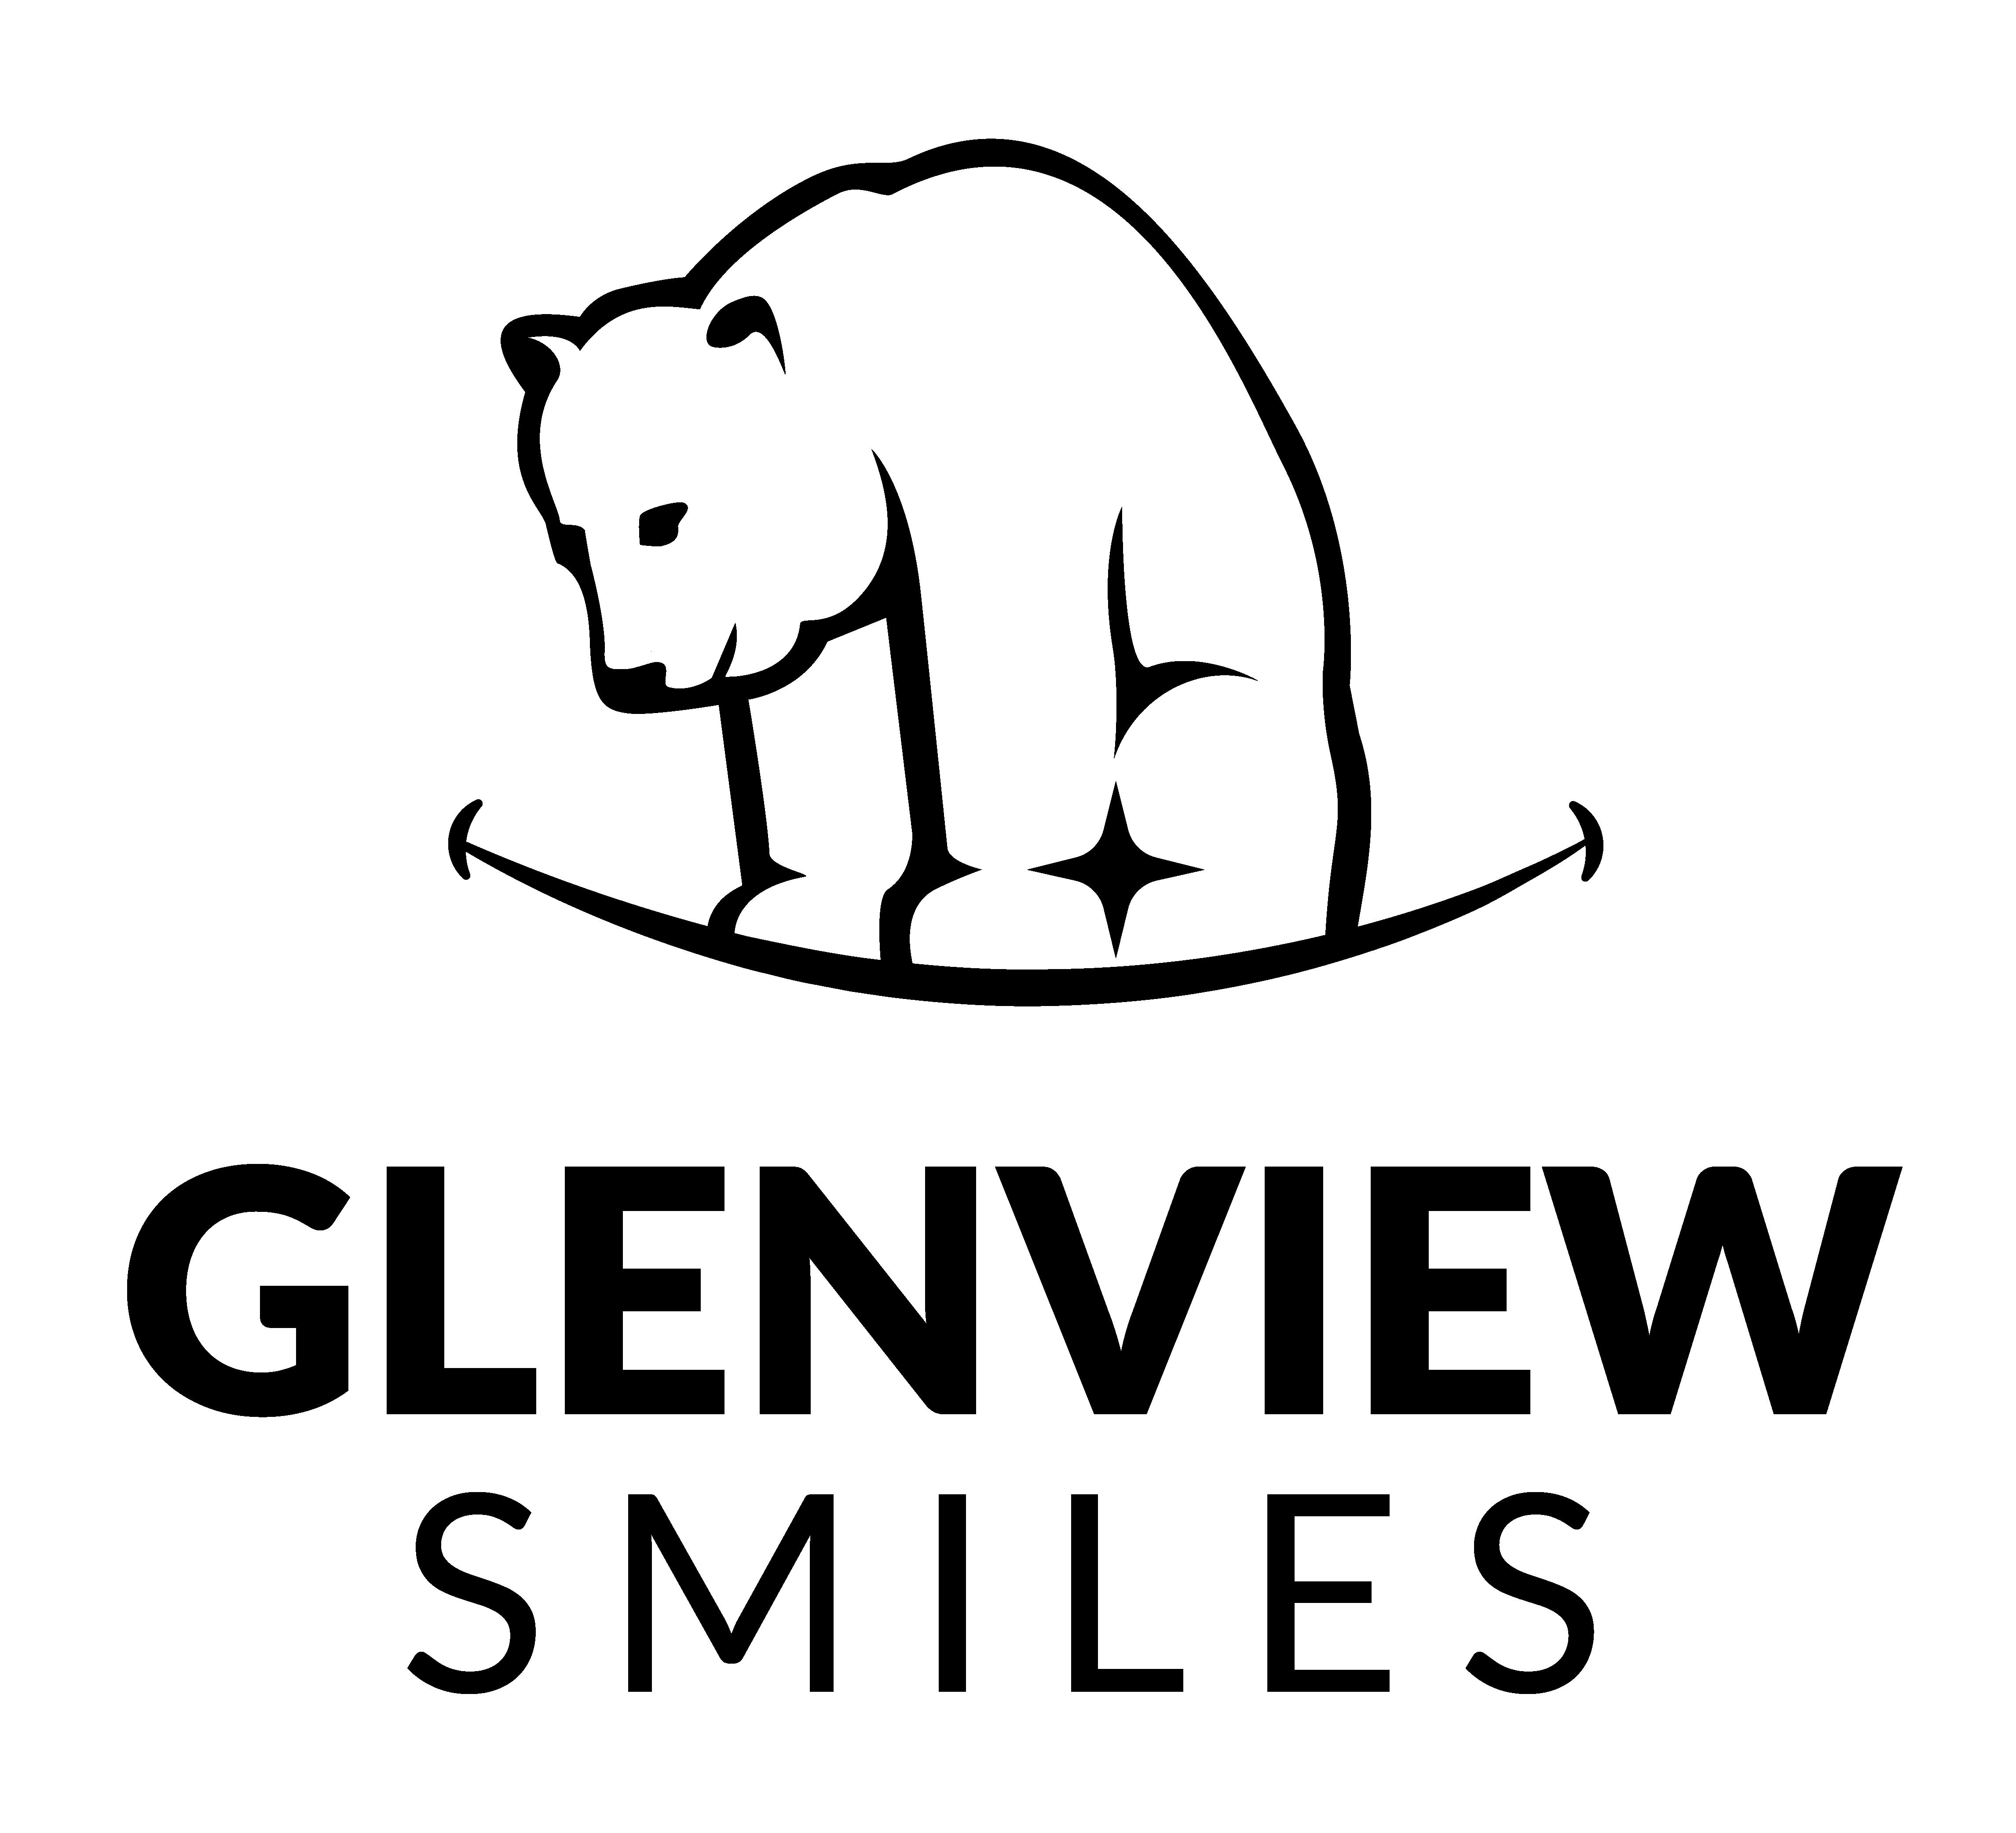 Dental Office Logo - Part of larger dental group